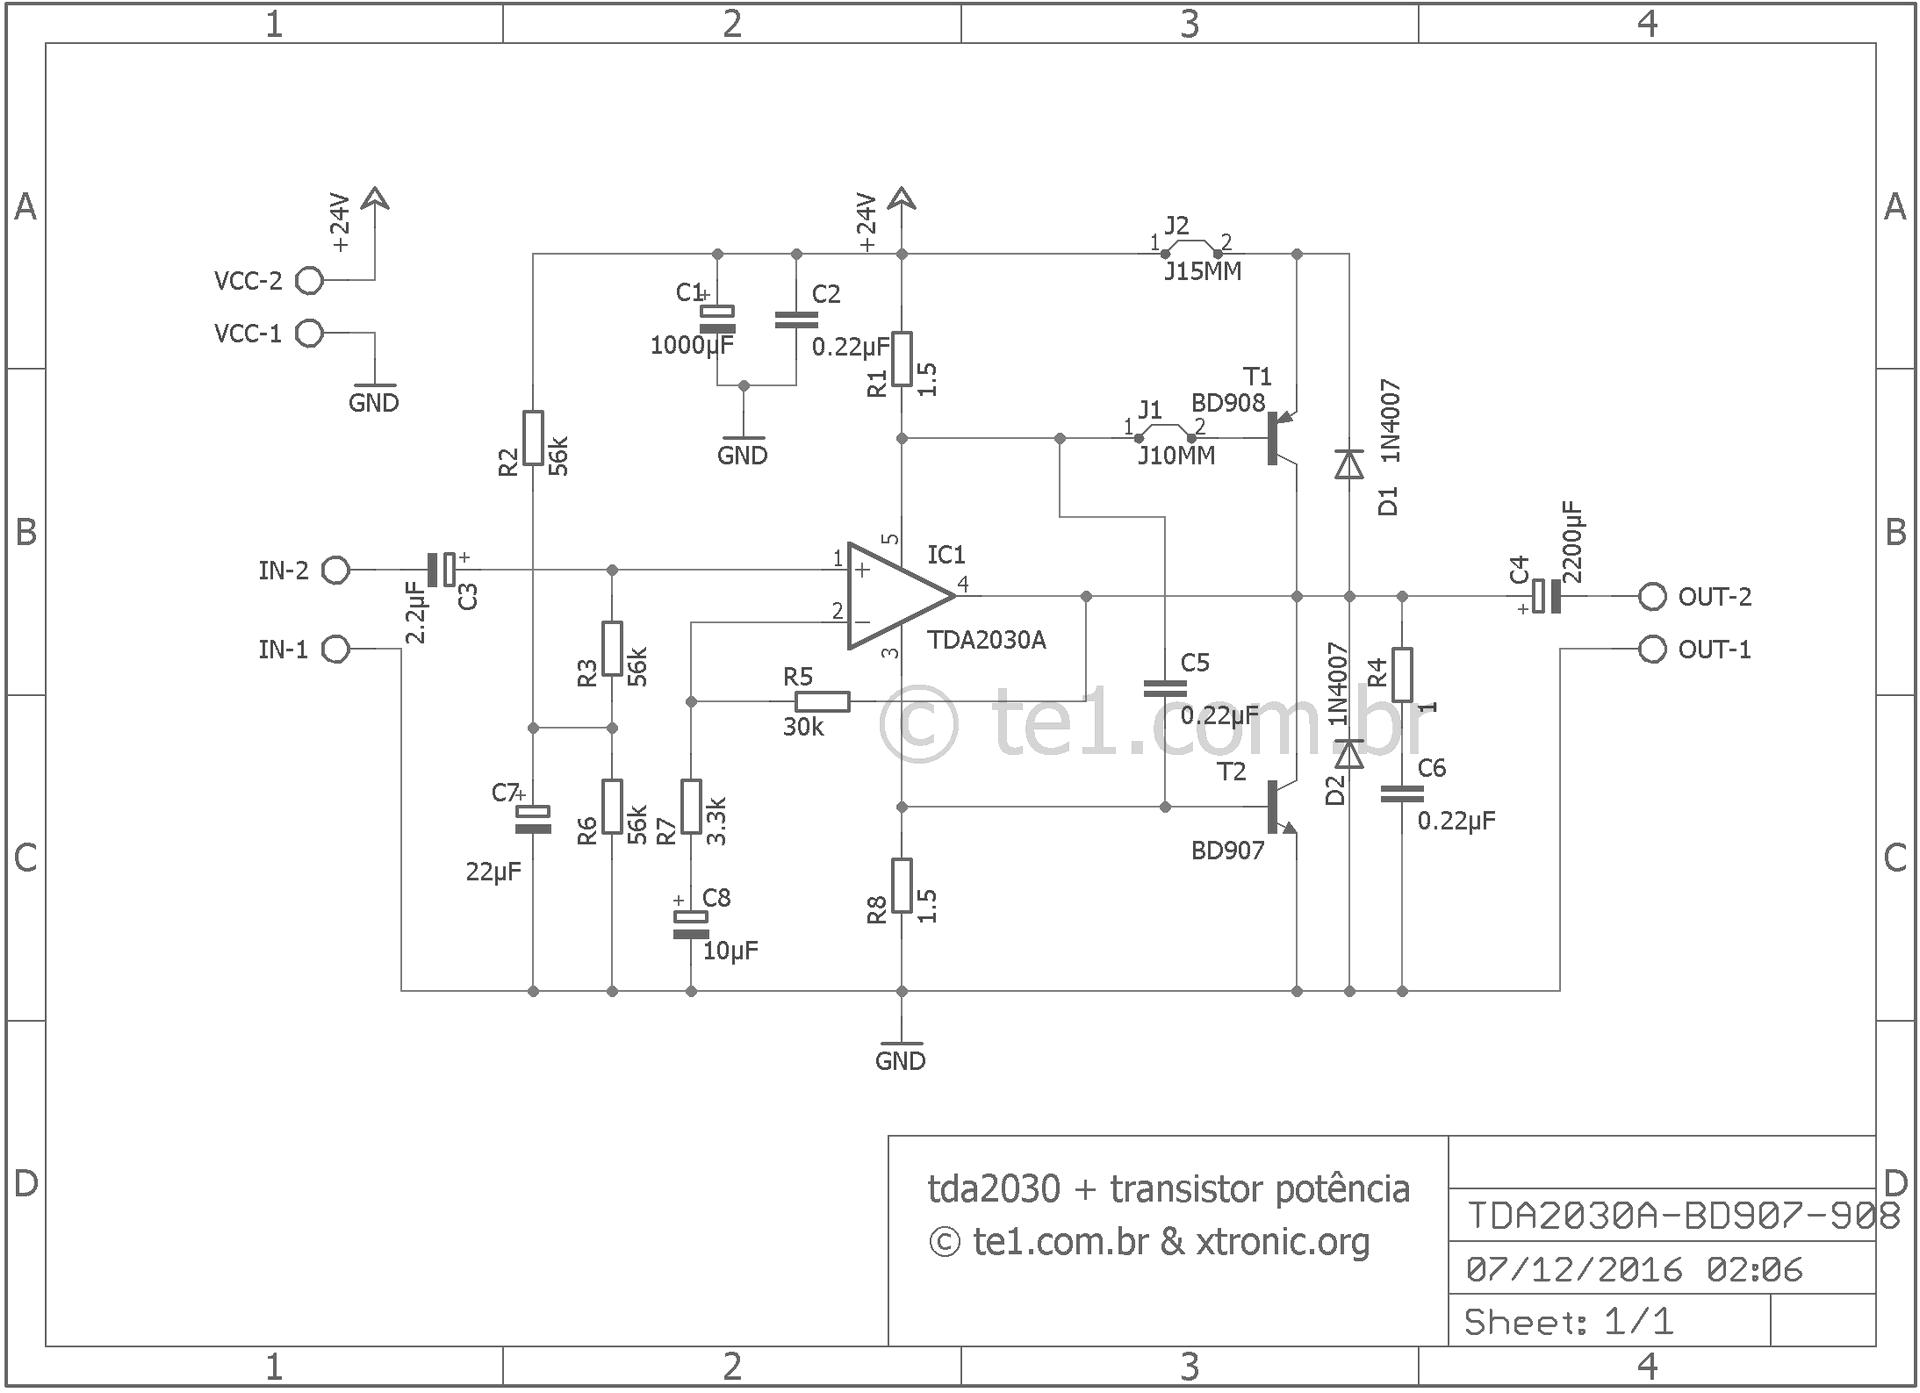 tda2030 40 watt amplifier transistor power esquem 700x508 amplificador pot ncia tda2030 transistores tip41 e tip42 [ 1920 x 1393 Pixel ]